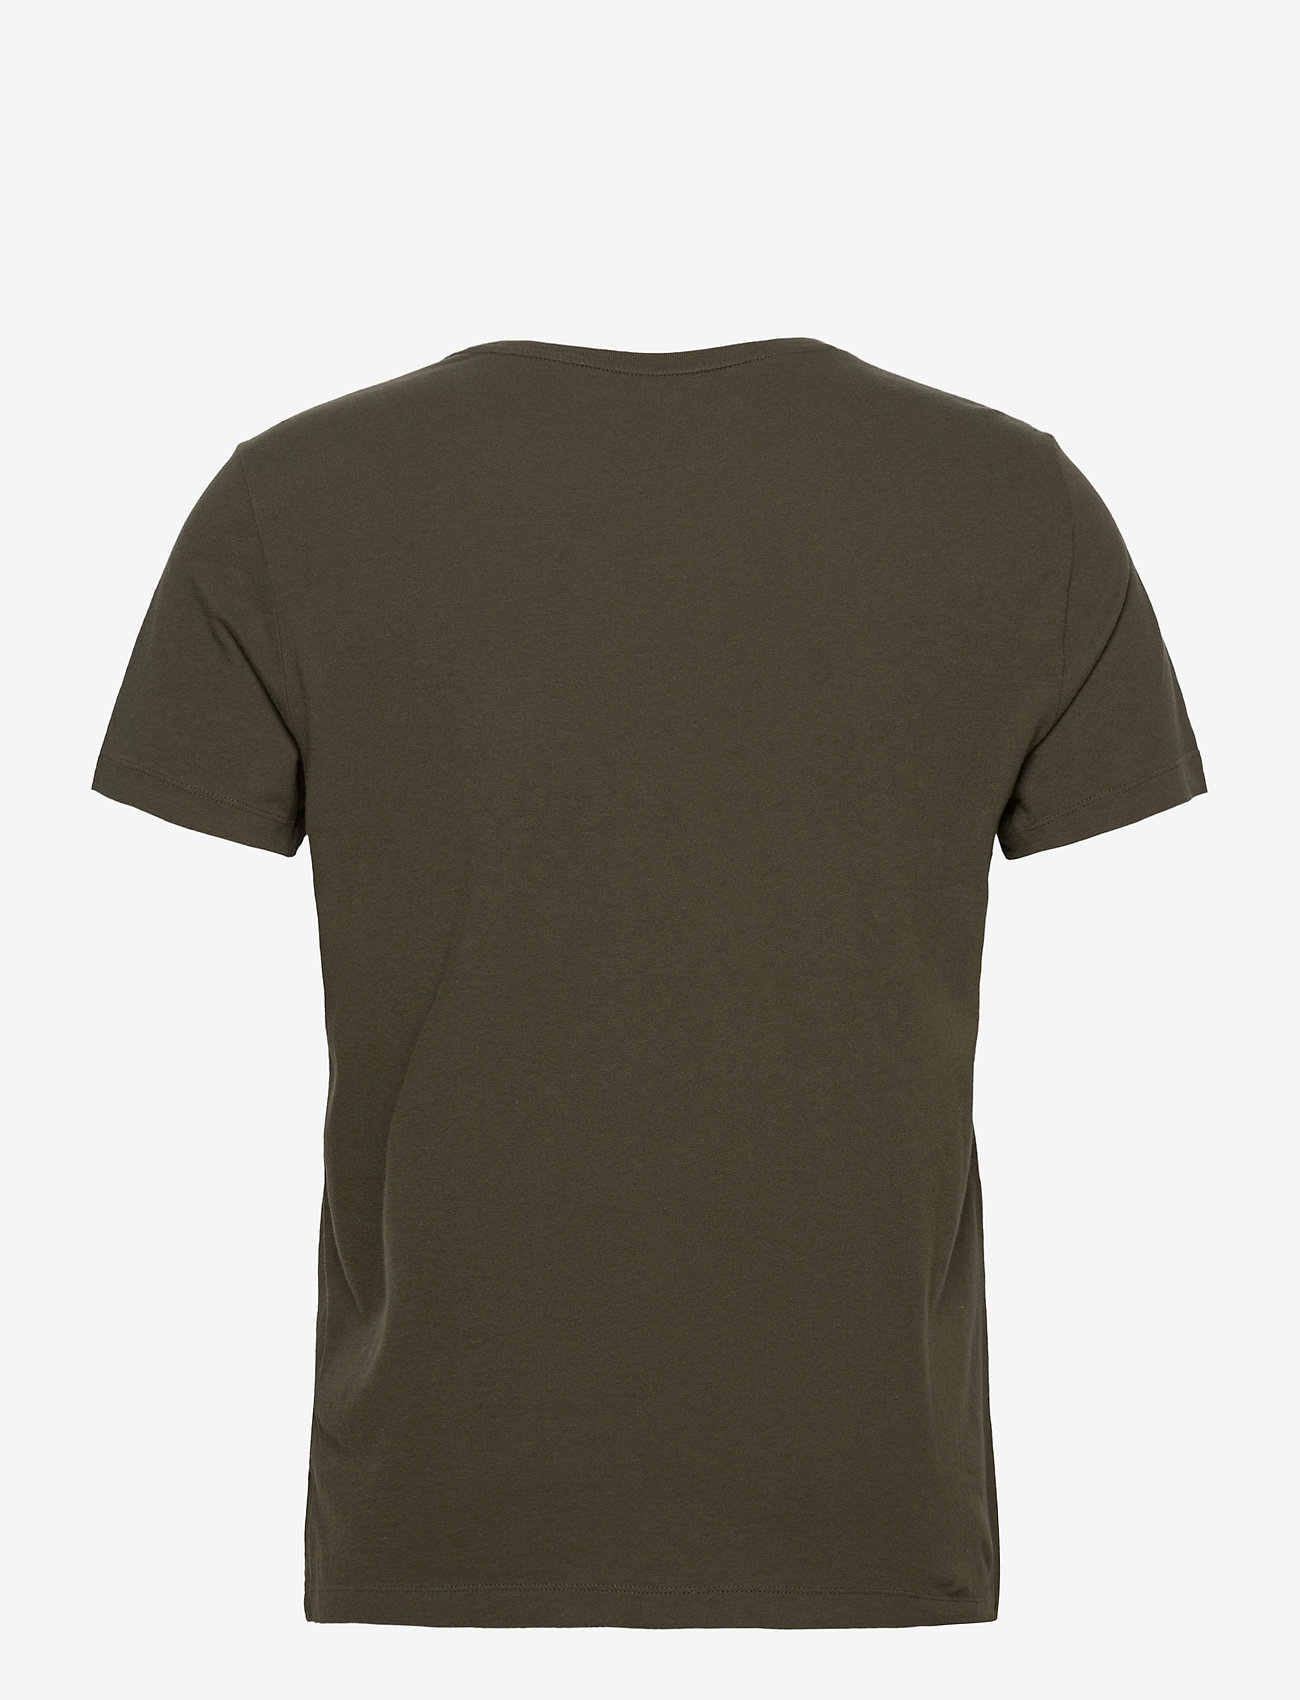 Banana Republic - I LOGO SOFTWASH ORGANIC TEE - basic t-shirts - nightshade global - 1